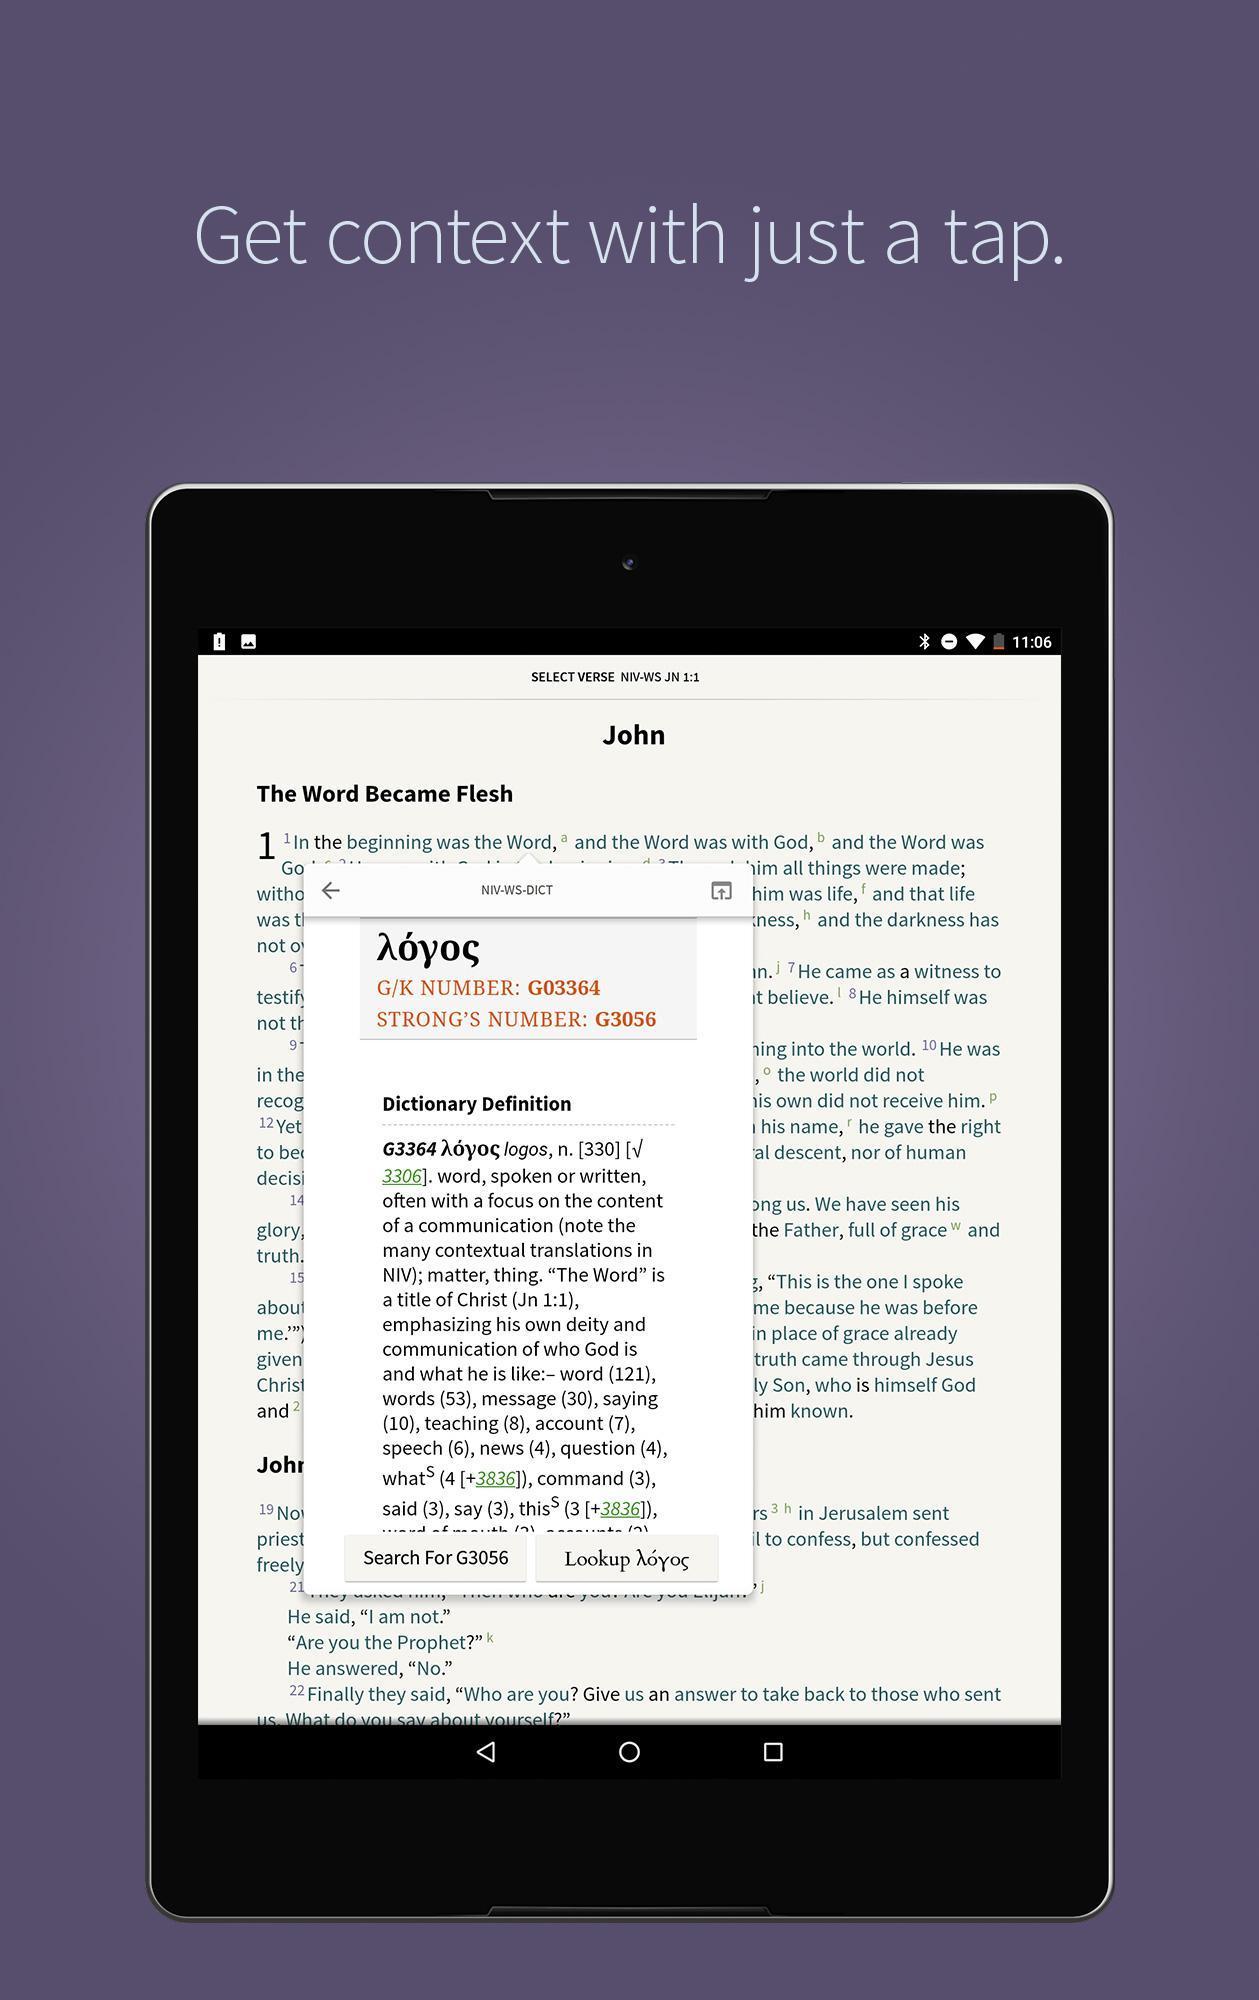 Bible App by Olive Tree 7.5.4.0.5664 Screenshot 24